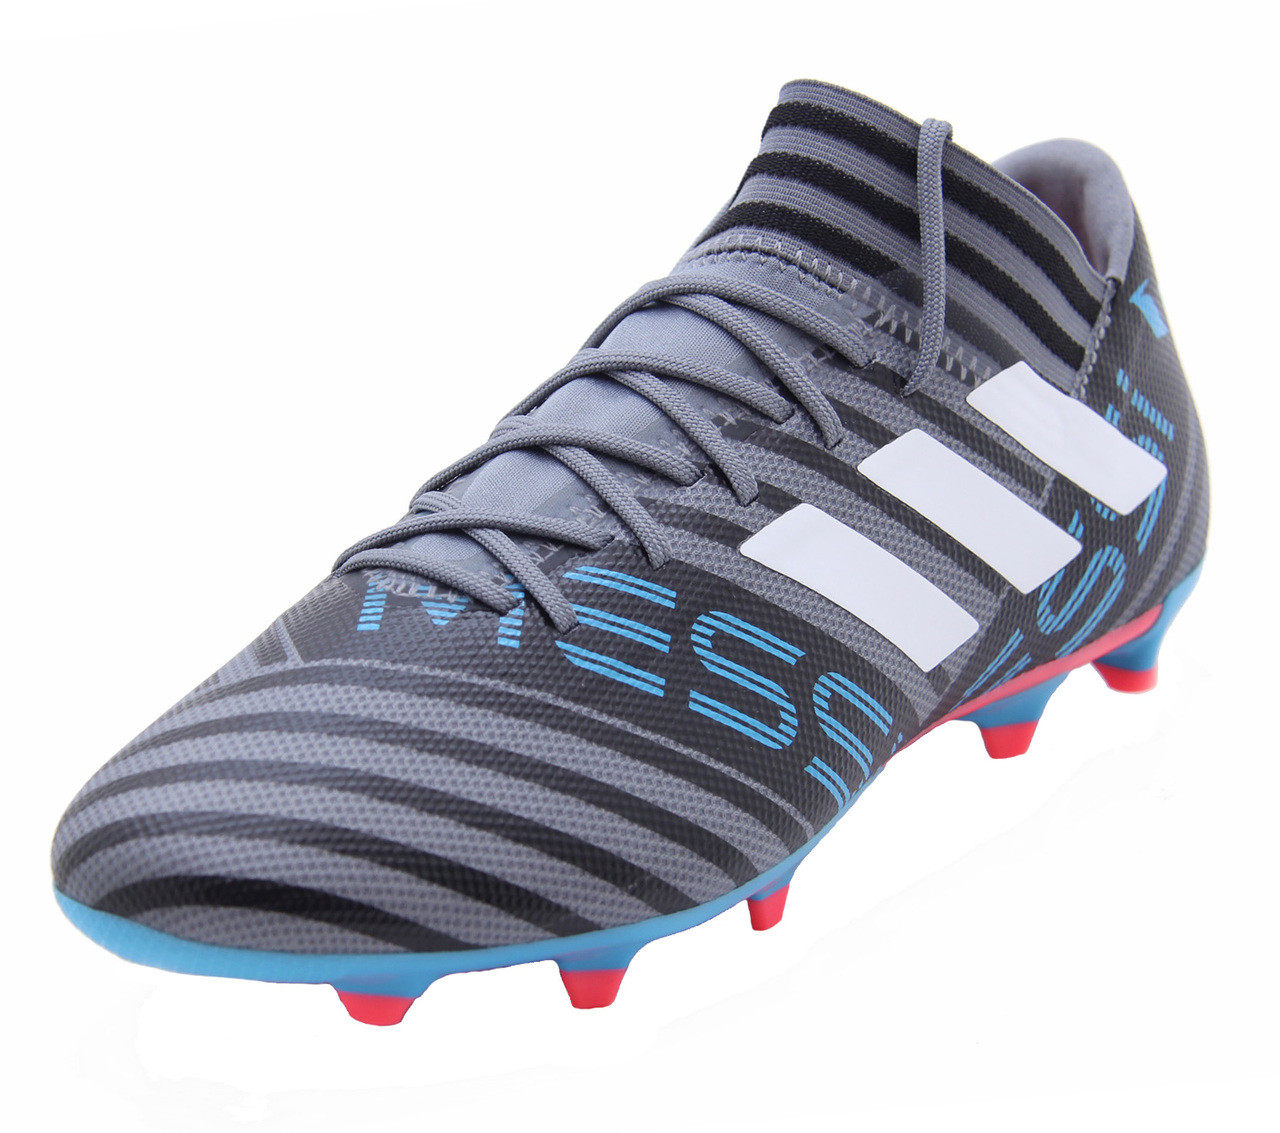 86744b41c40 Adidas Nemeziz Messi 17.3 FG - Grey White Core Black (011918) - ohp soccer